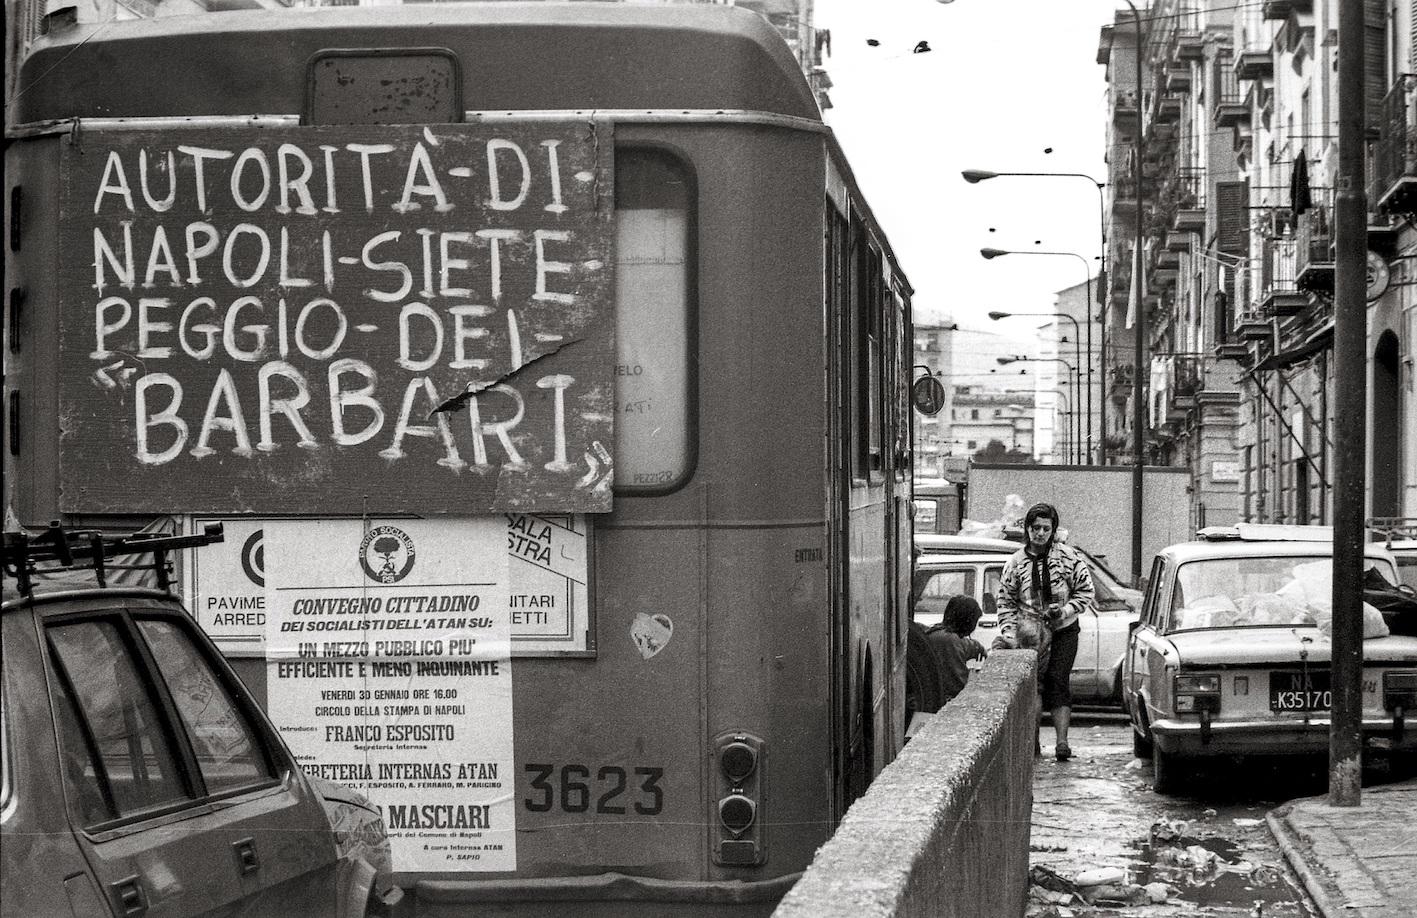 Toty Ruggieri, Napoli 1981